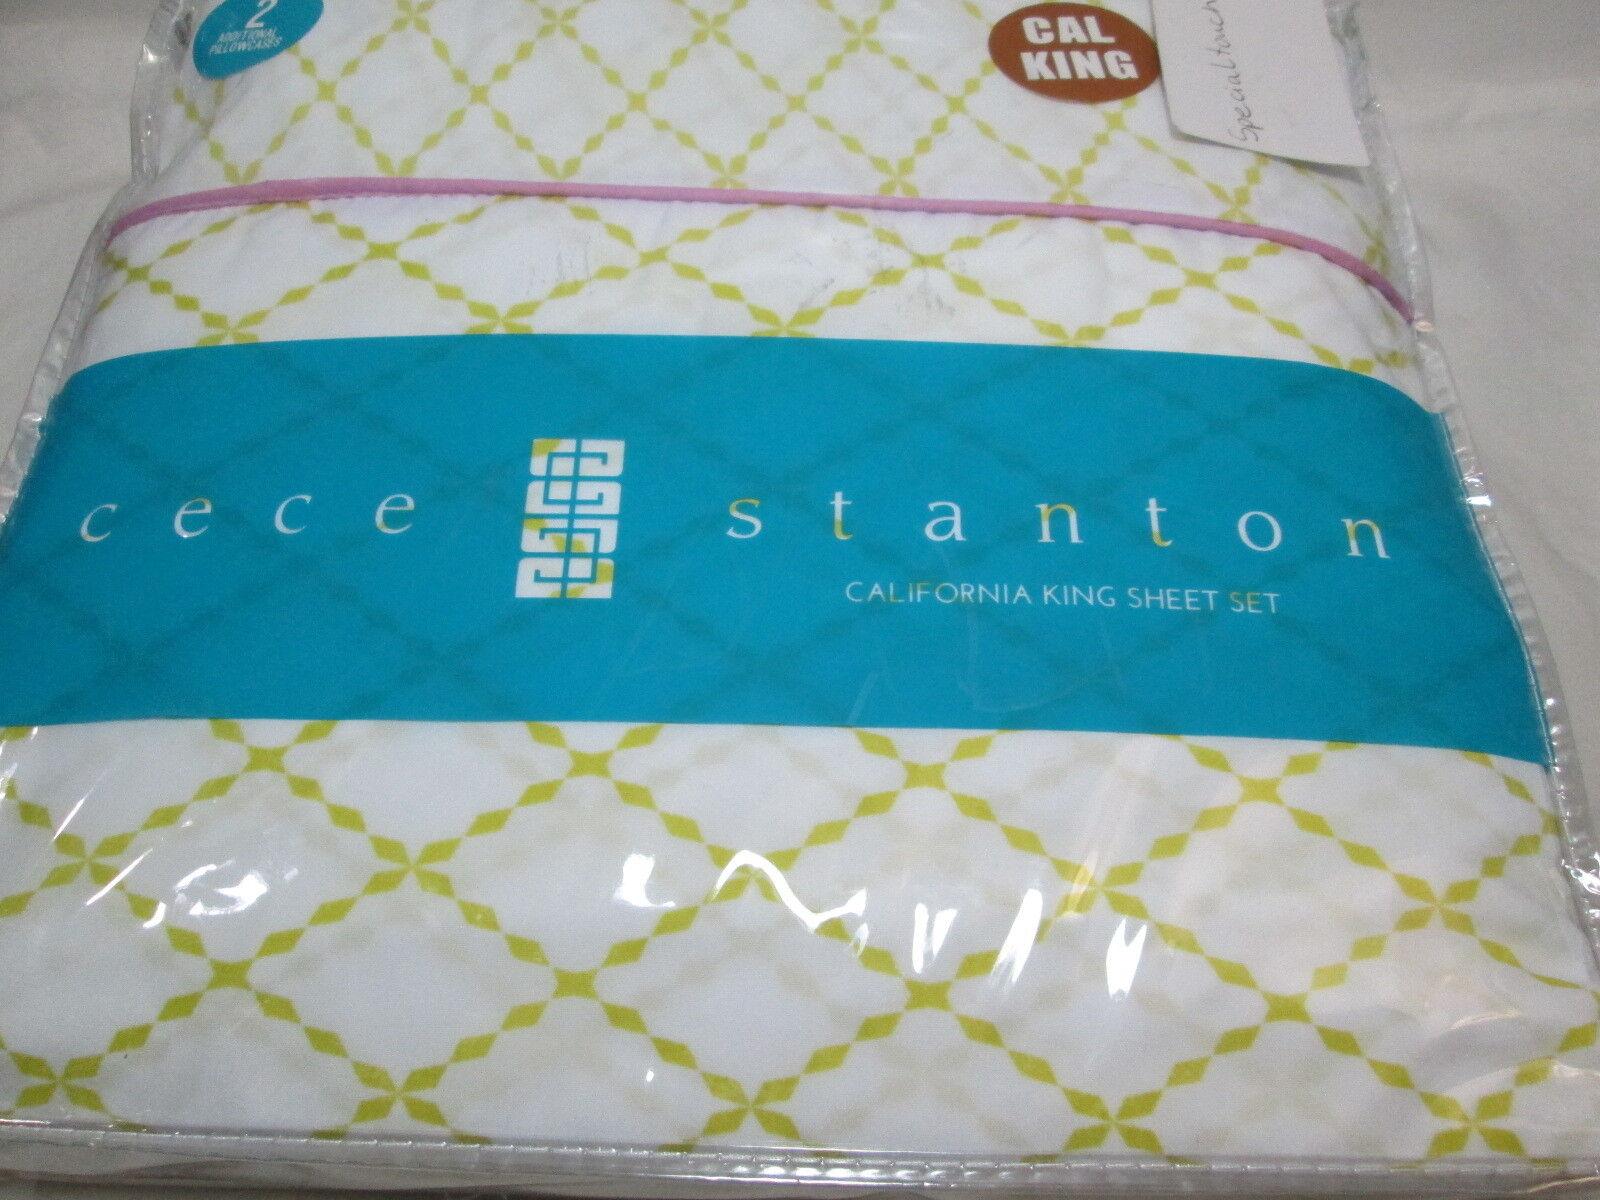 6 pcs Cece Stanton MORGAN Cal California King Microfiber Sheet Set - Lime White